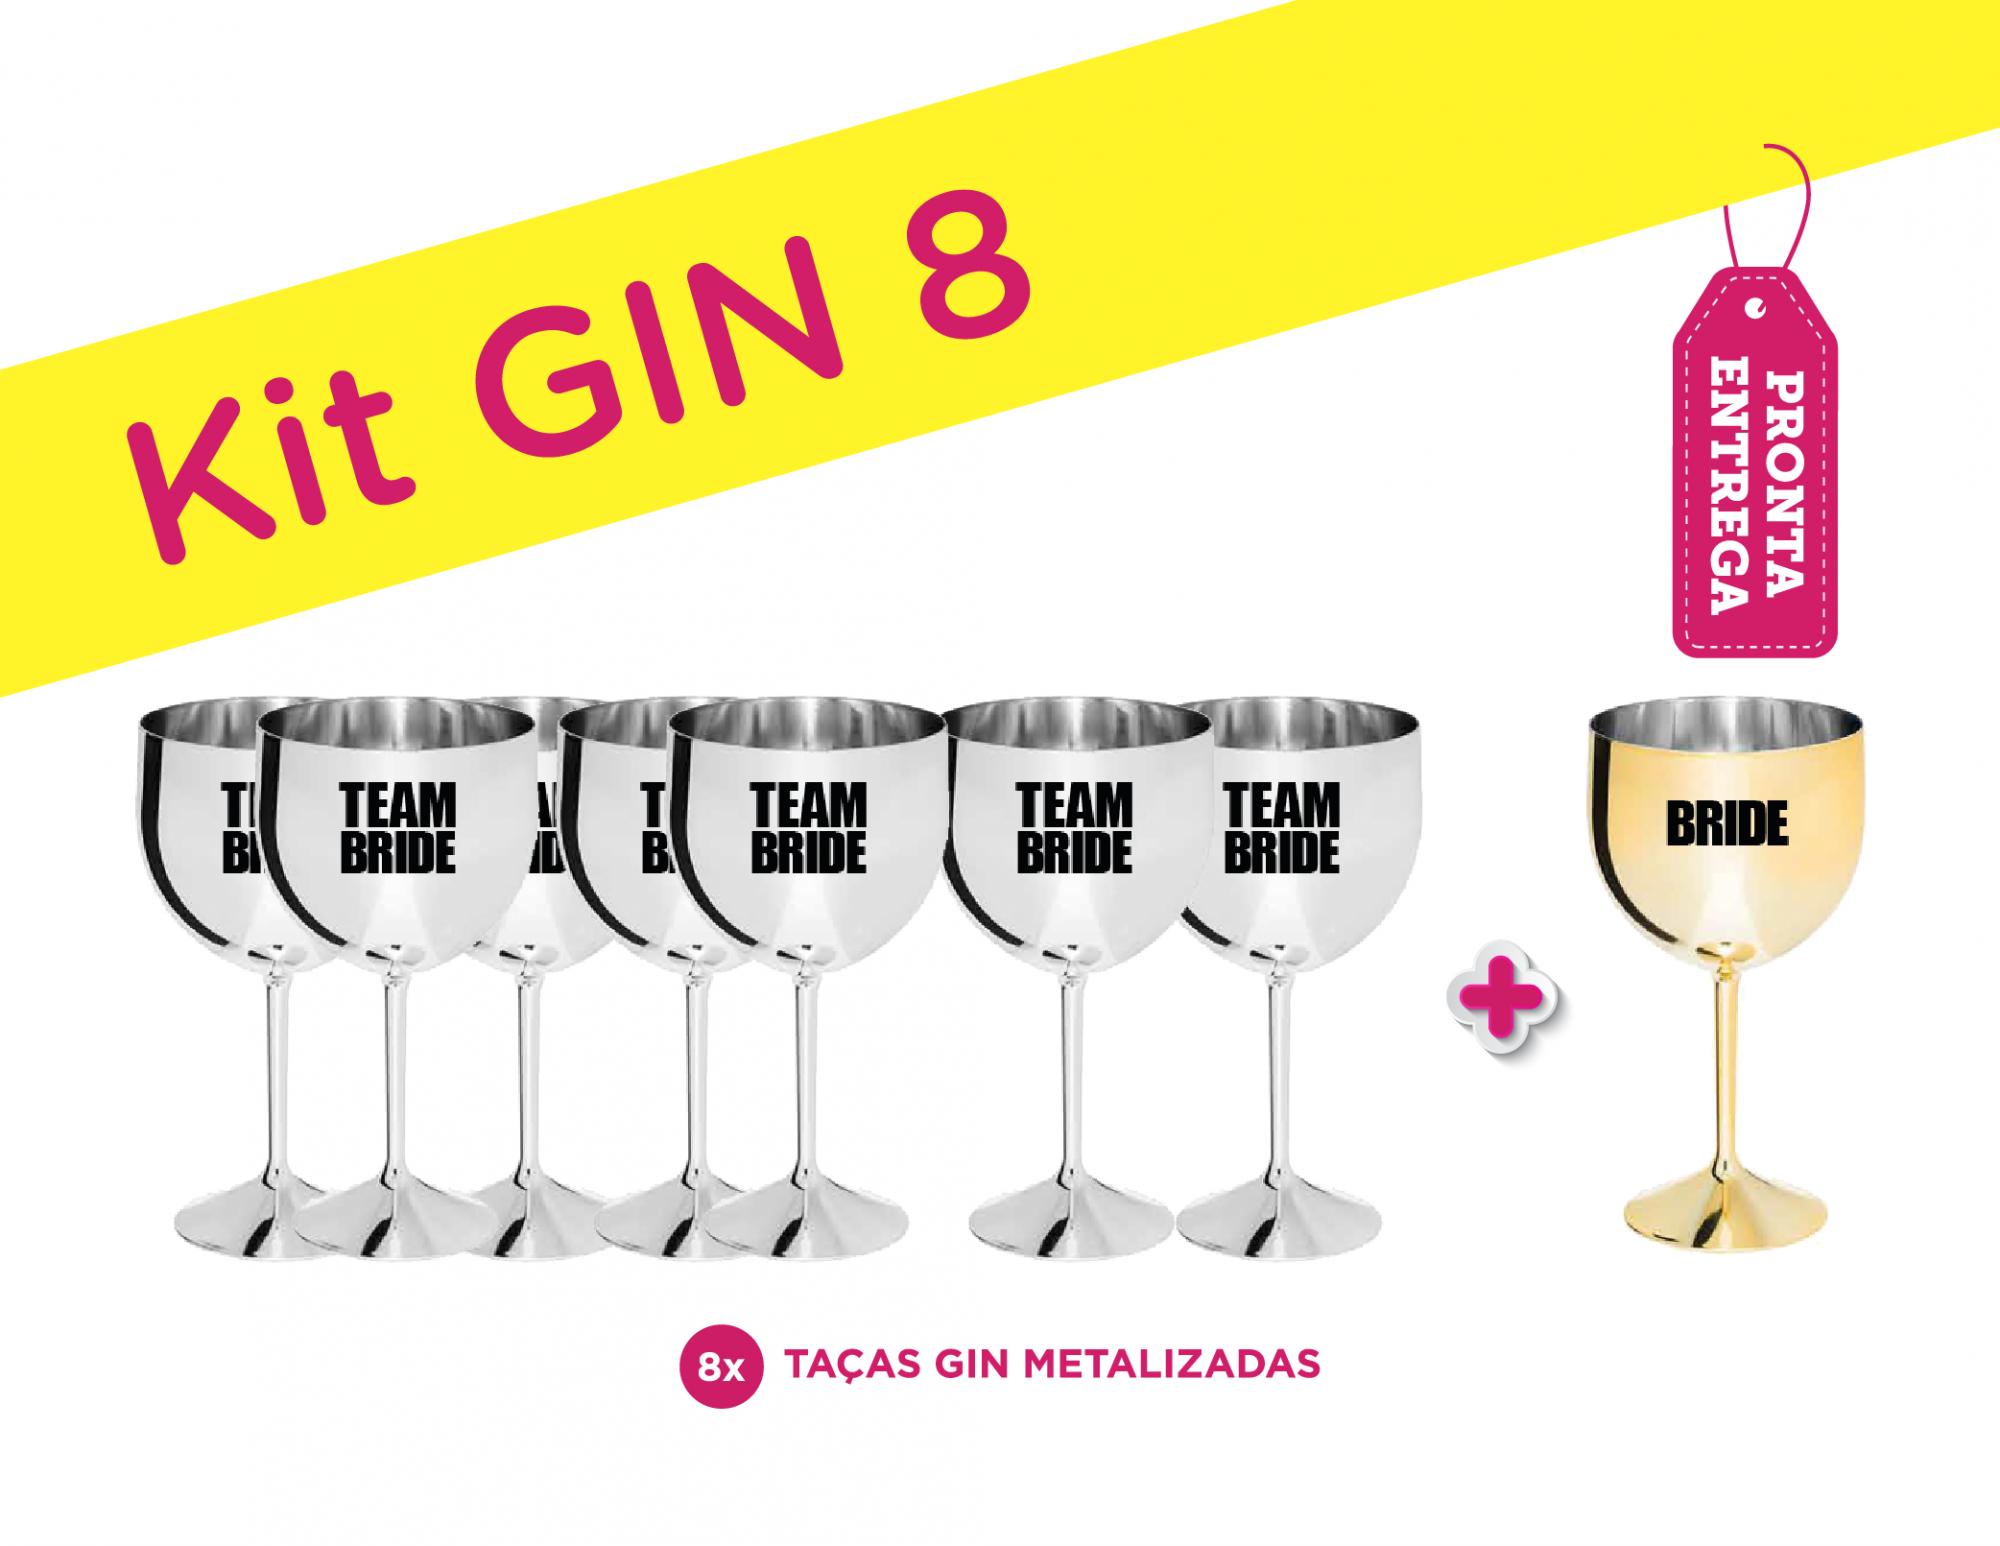 Kit Gin 8 Metalizado Bride/Team Bride Pronta Entrega para Despedida de Solteira